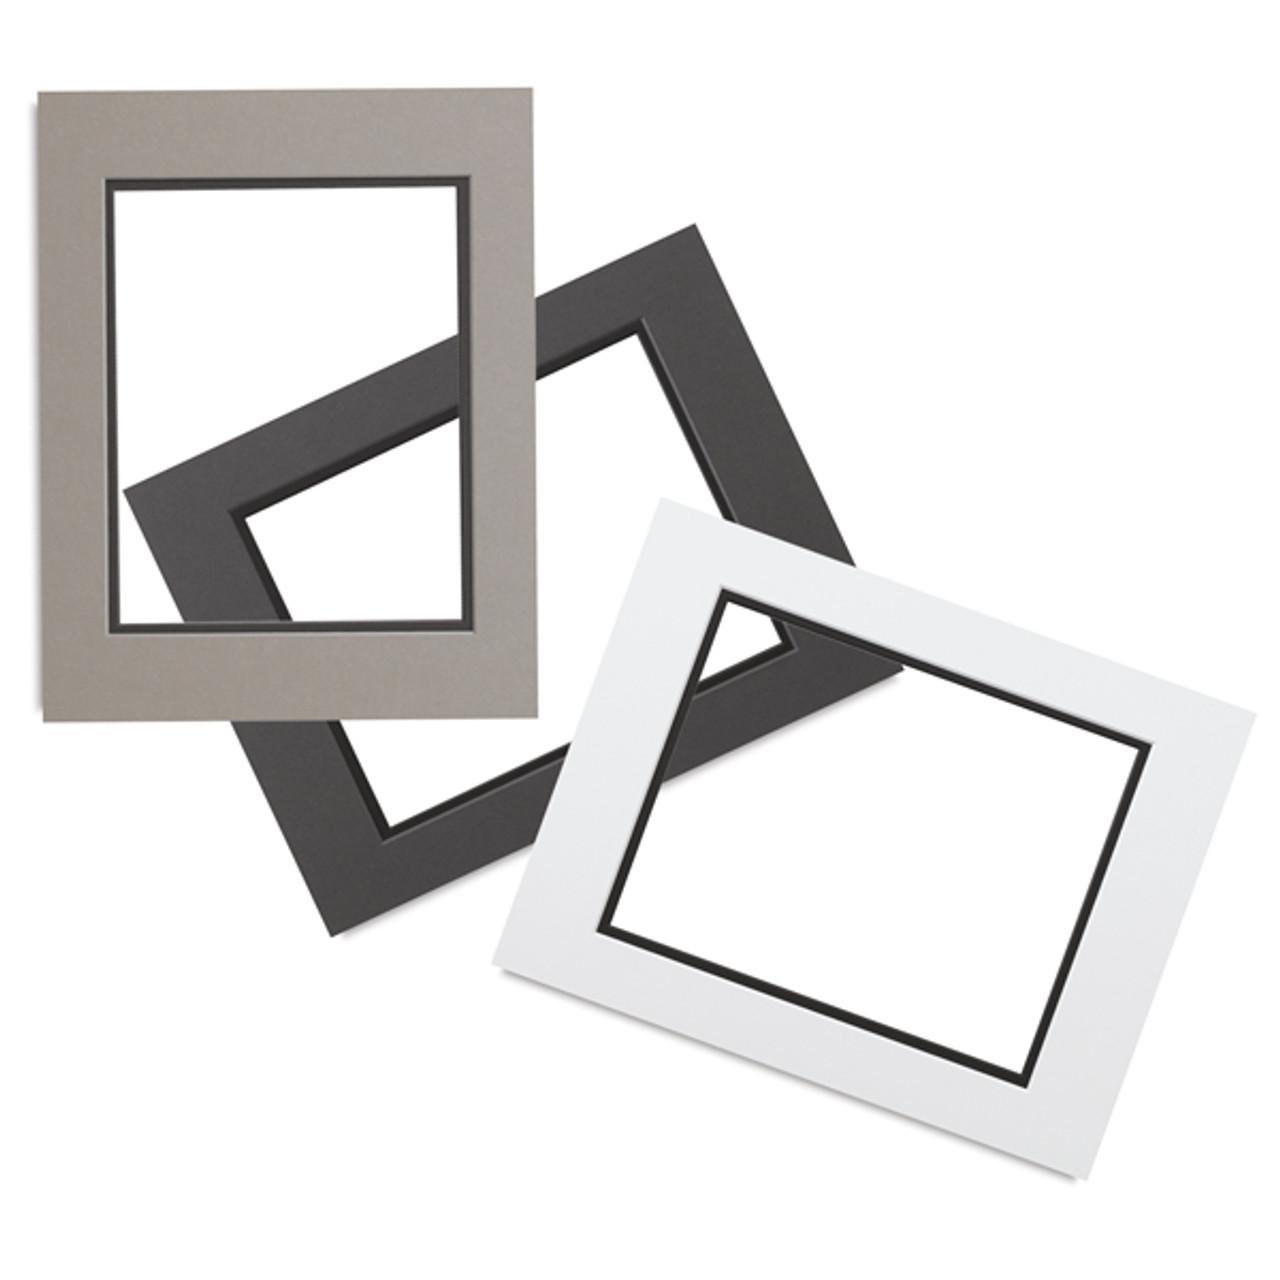 0.060\'\' White Core Double Mats : 16 X 20 For 8.5 X 11 Artwork